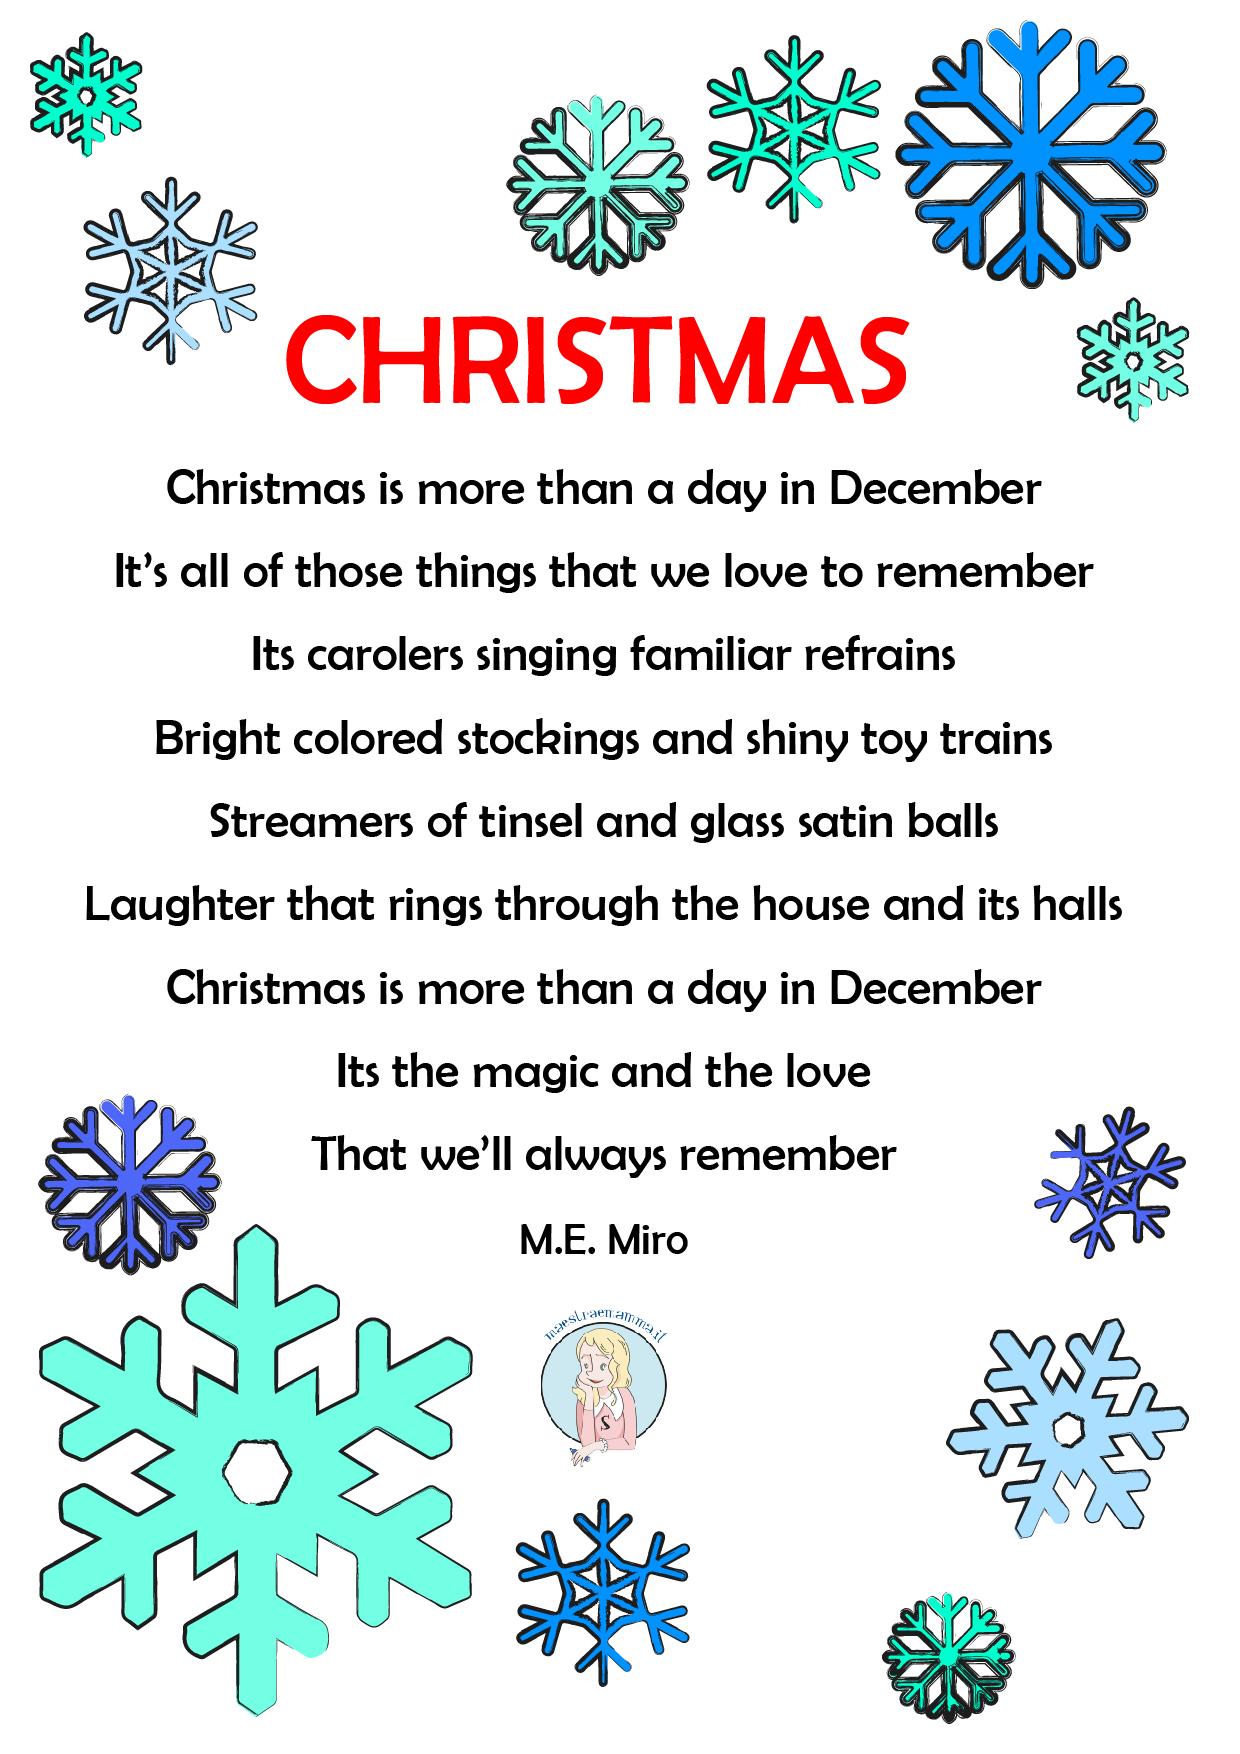 Poesie Di Natale In Inglese Per Bambini.Best Christmas Poems For Kids Poesie Di Natale In Inglese